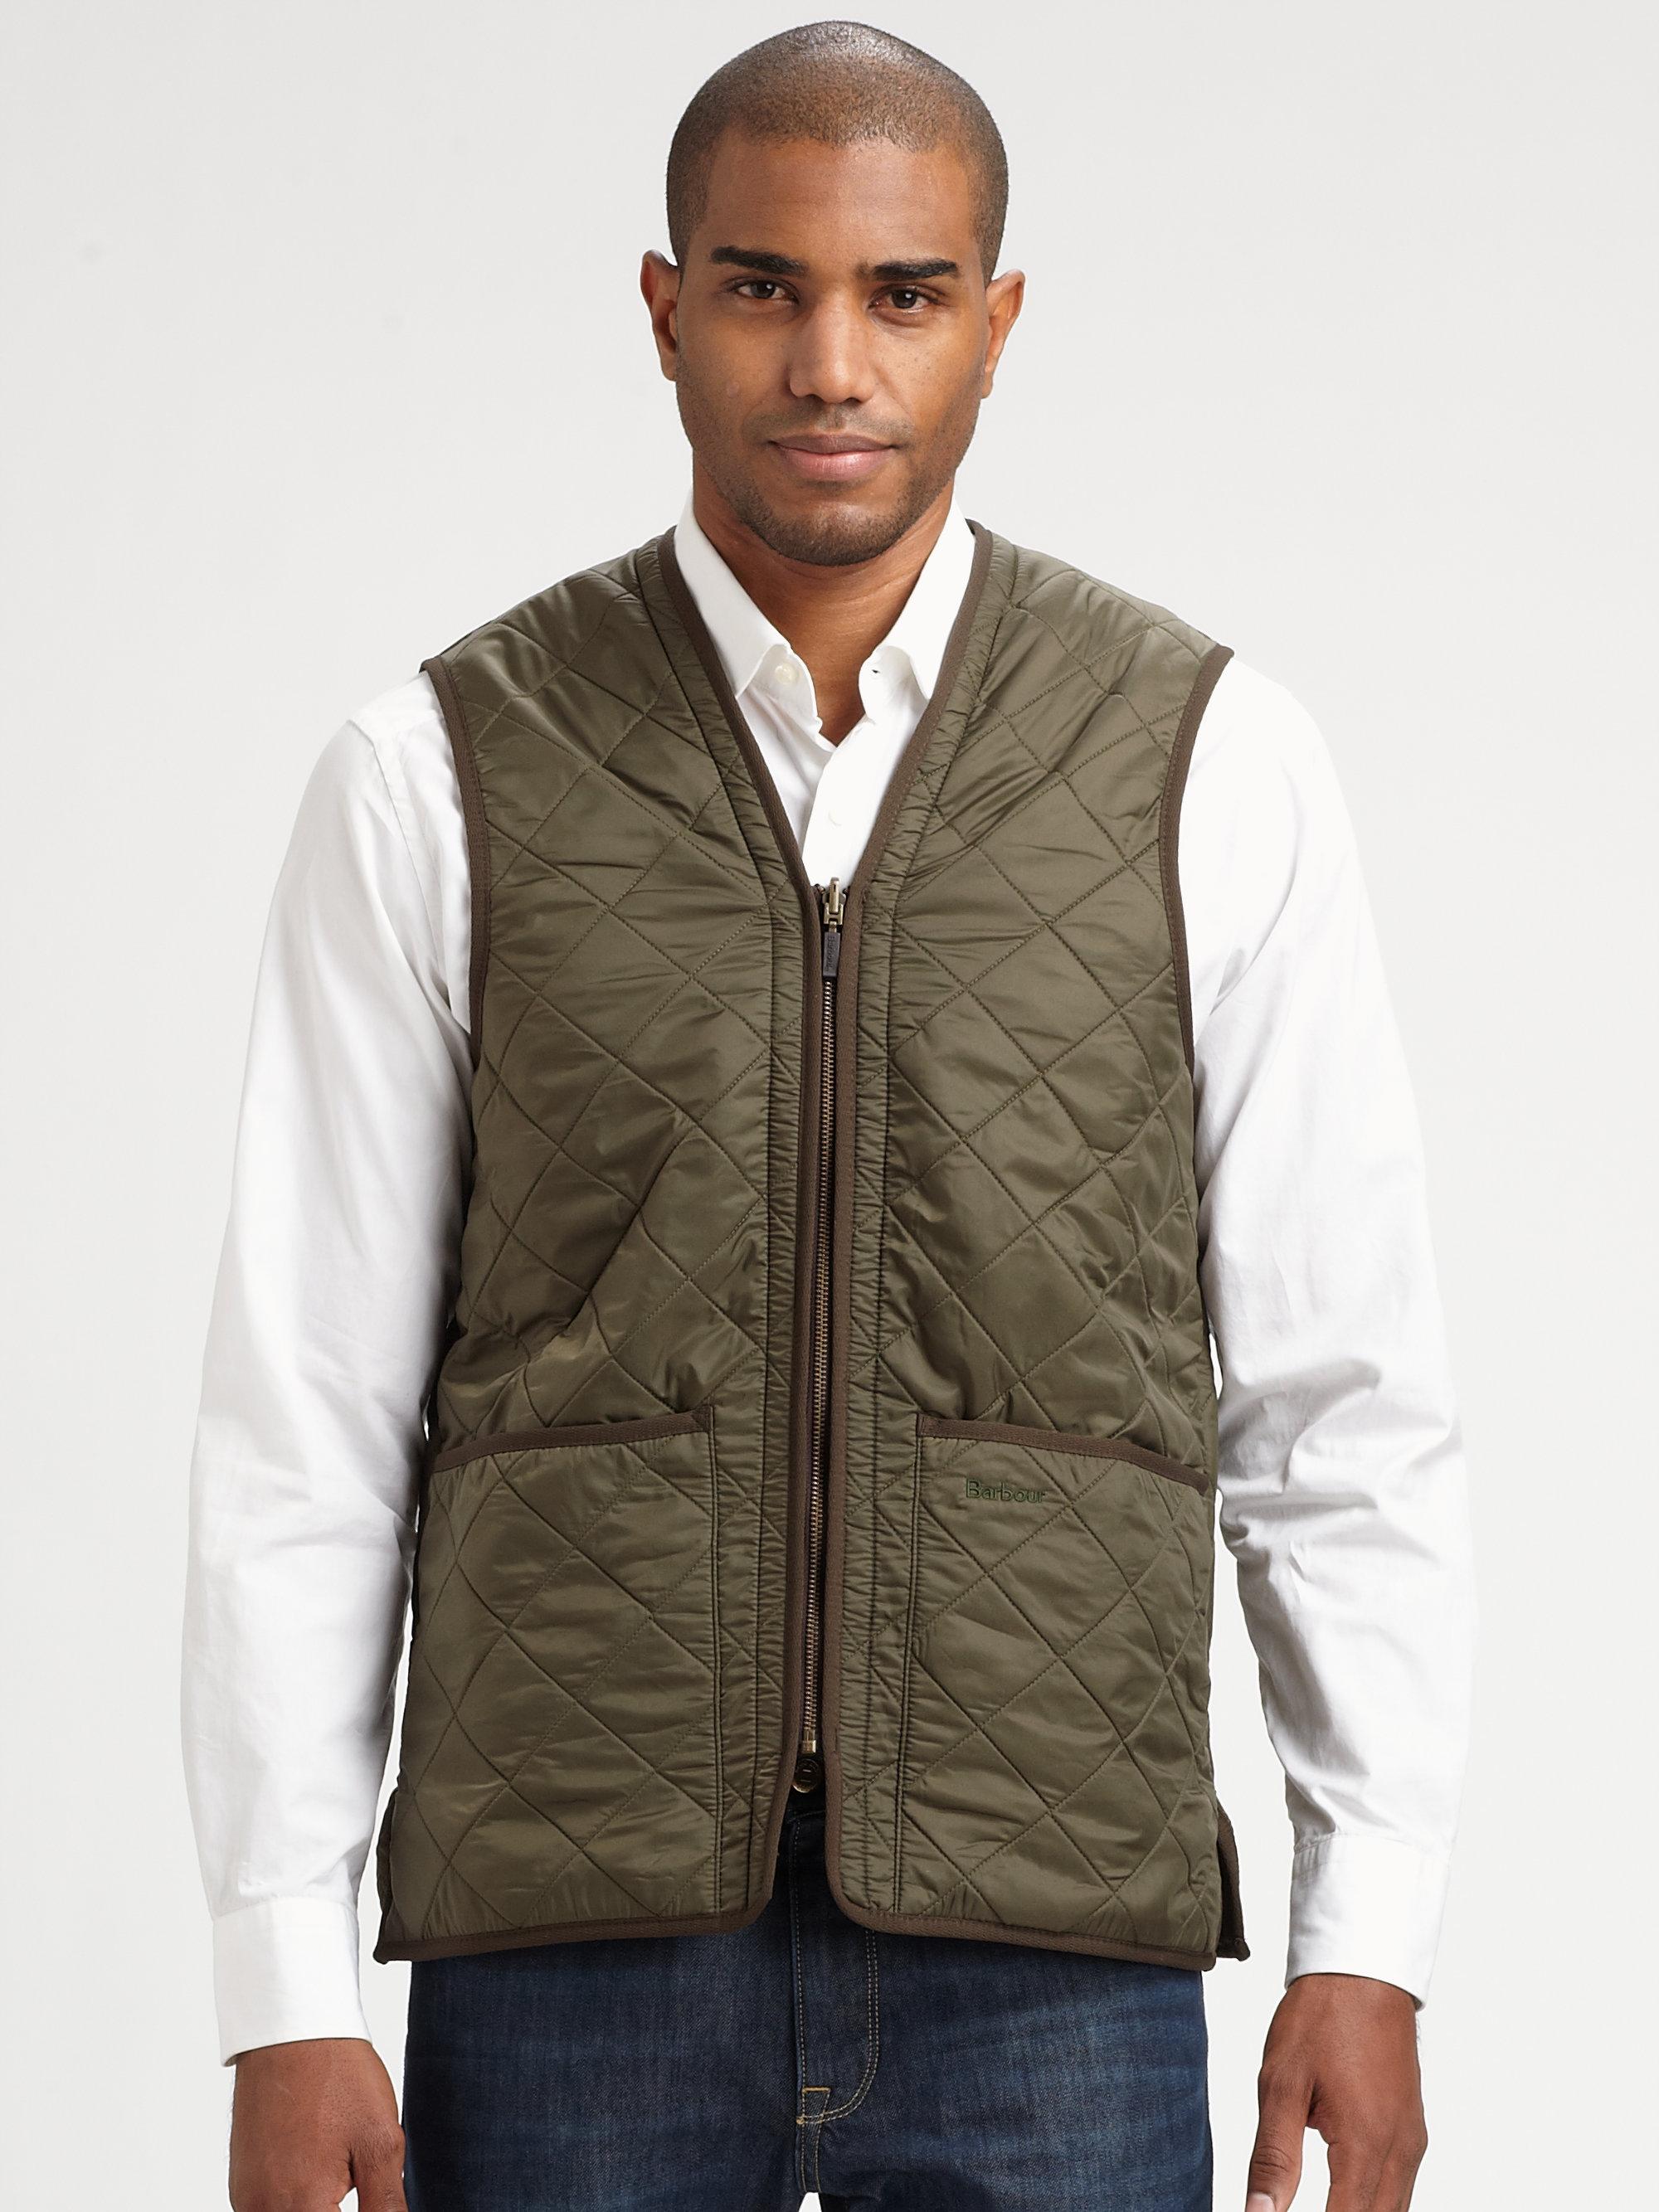 Lyst - Barbour Quilted Vest in Green for Men : barbour quilted vest mens - Adamdwight.com